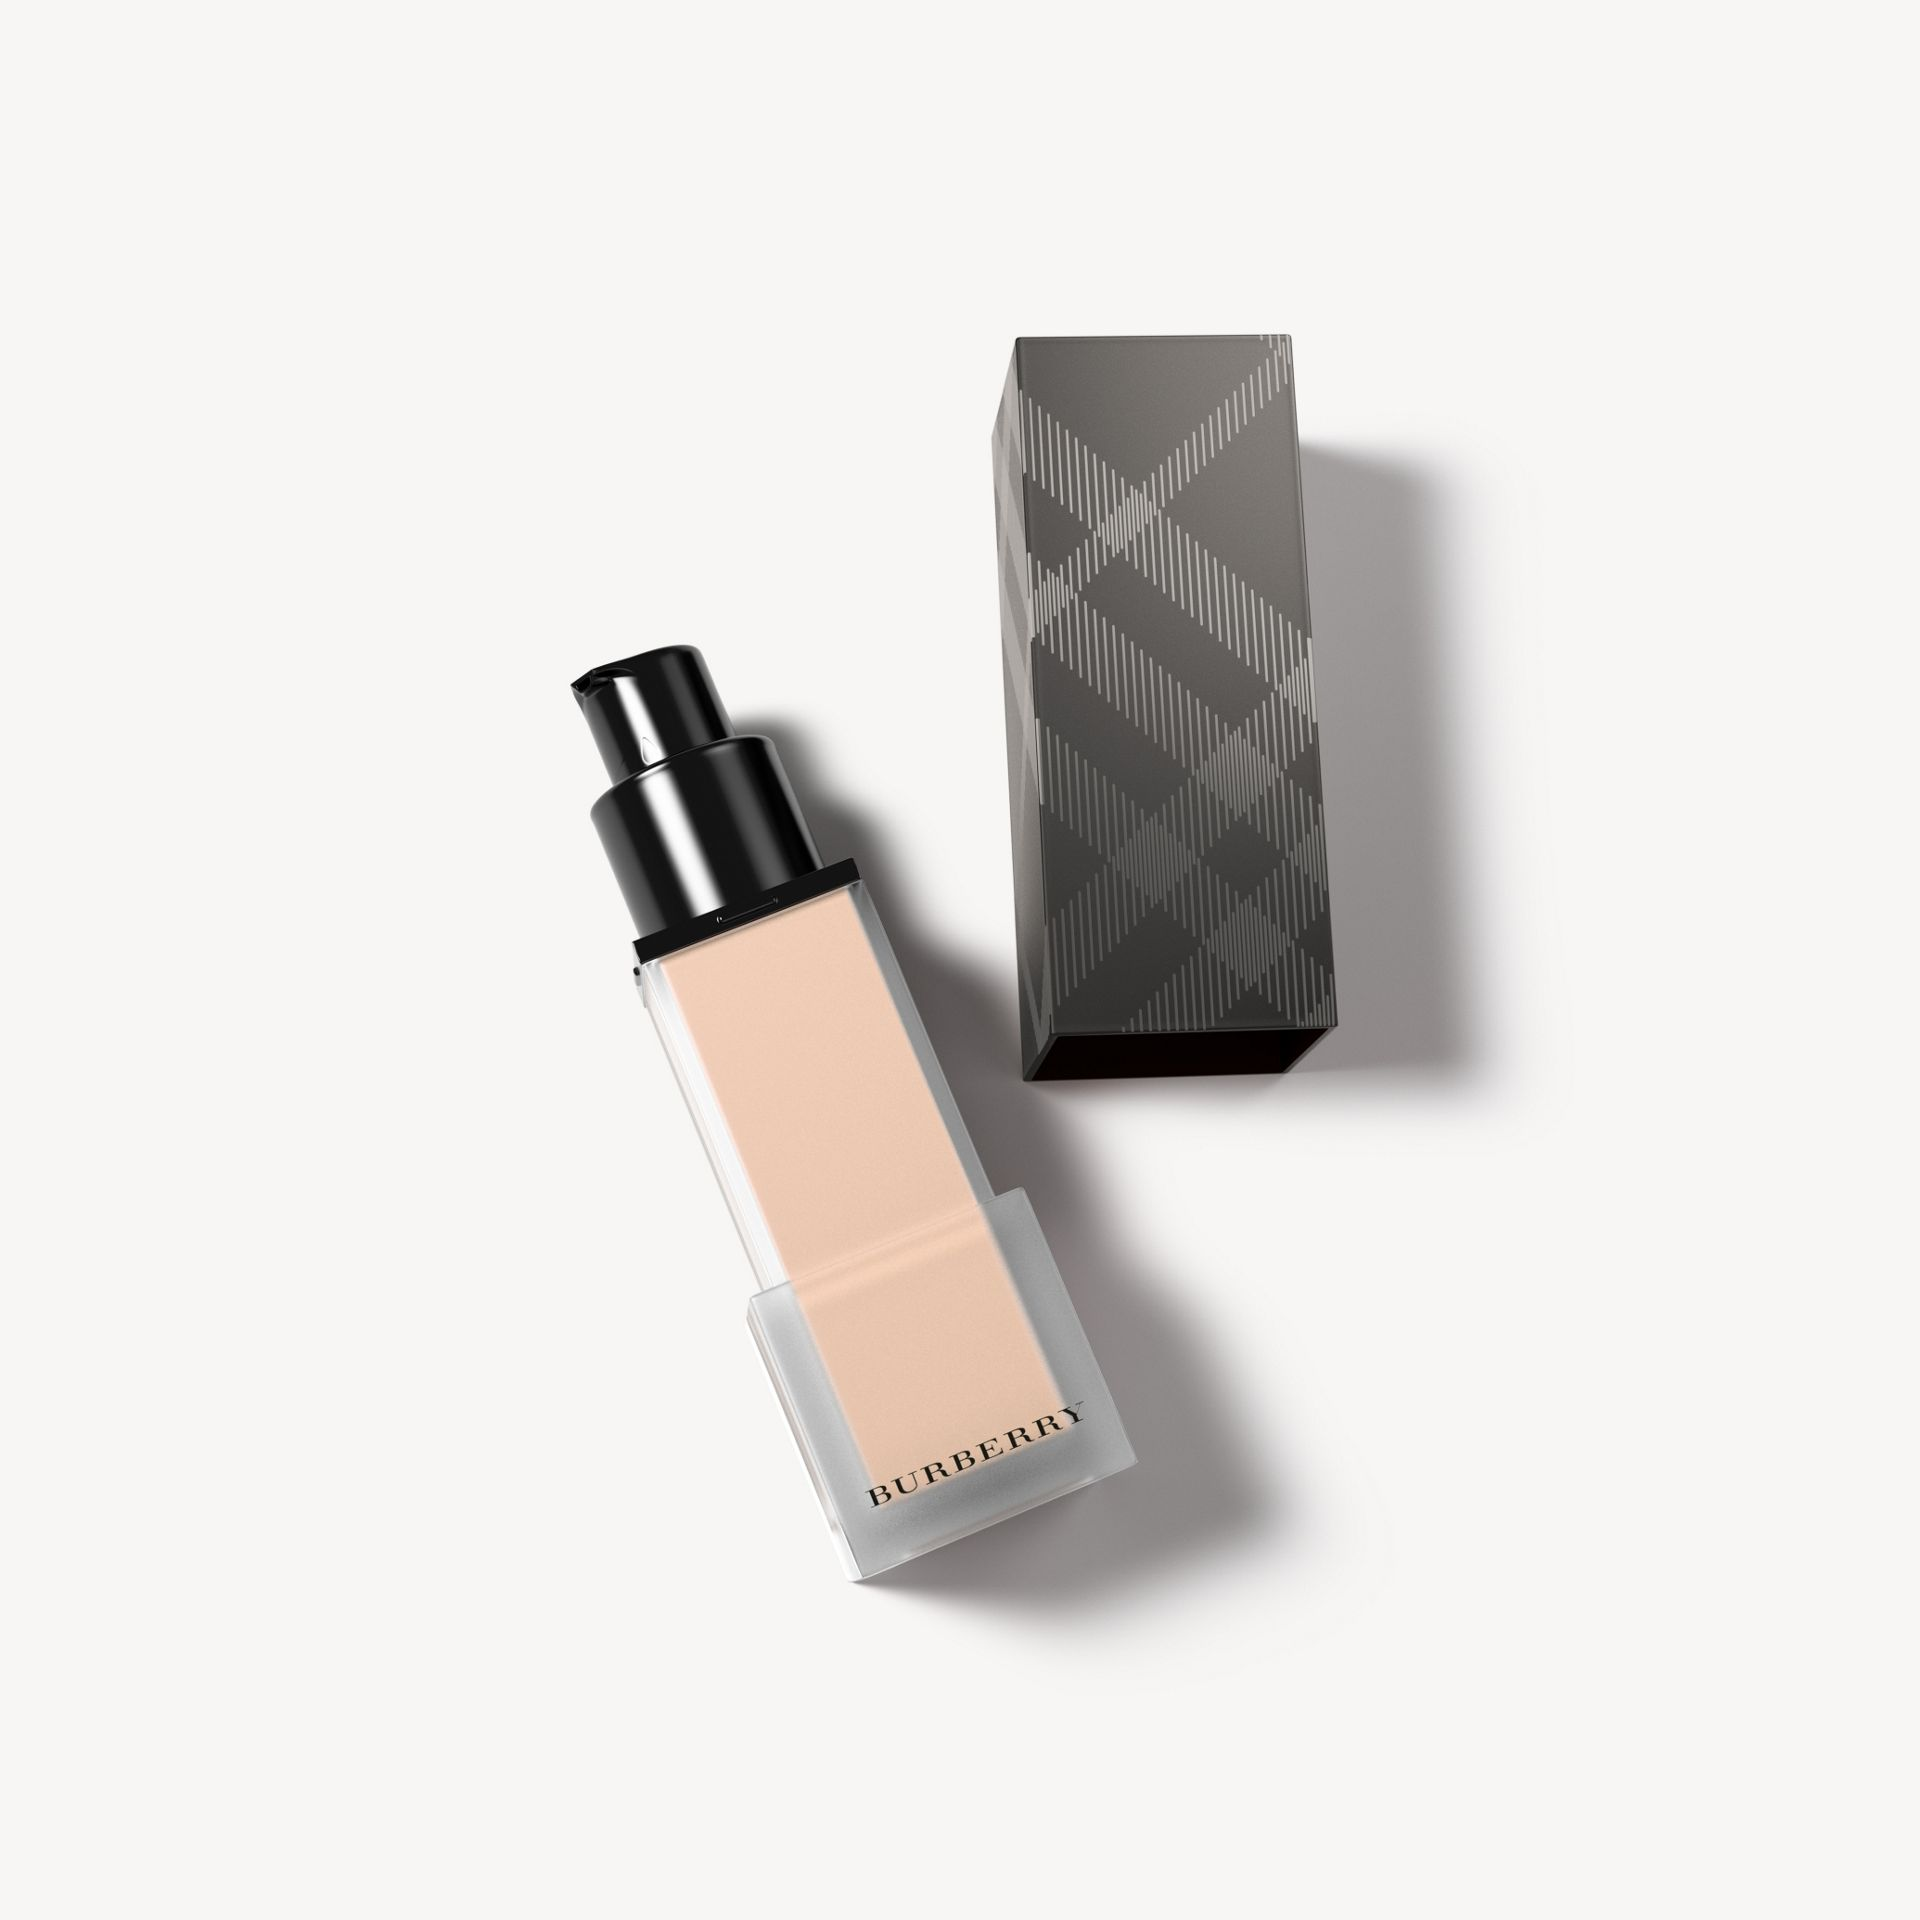 Burberry 霧柔喀什米爾粉底液 SPF 20 - 赭石裸色 12 號 - 女款 | Burberry - 圖庫照片 0